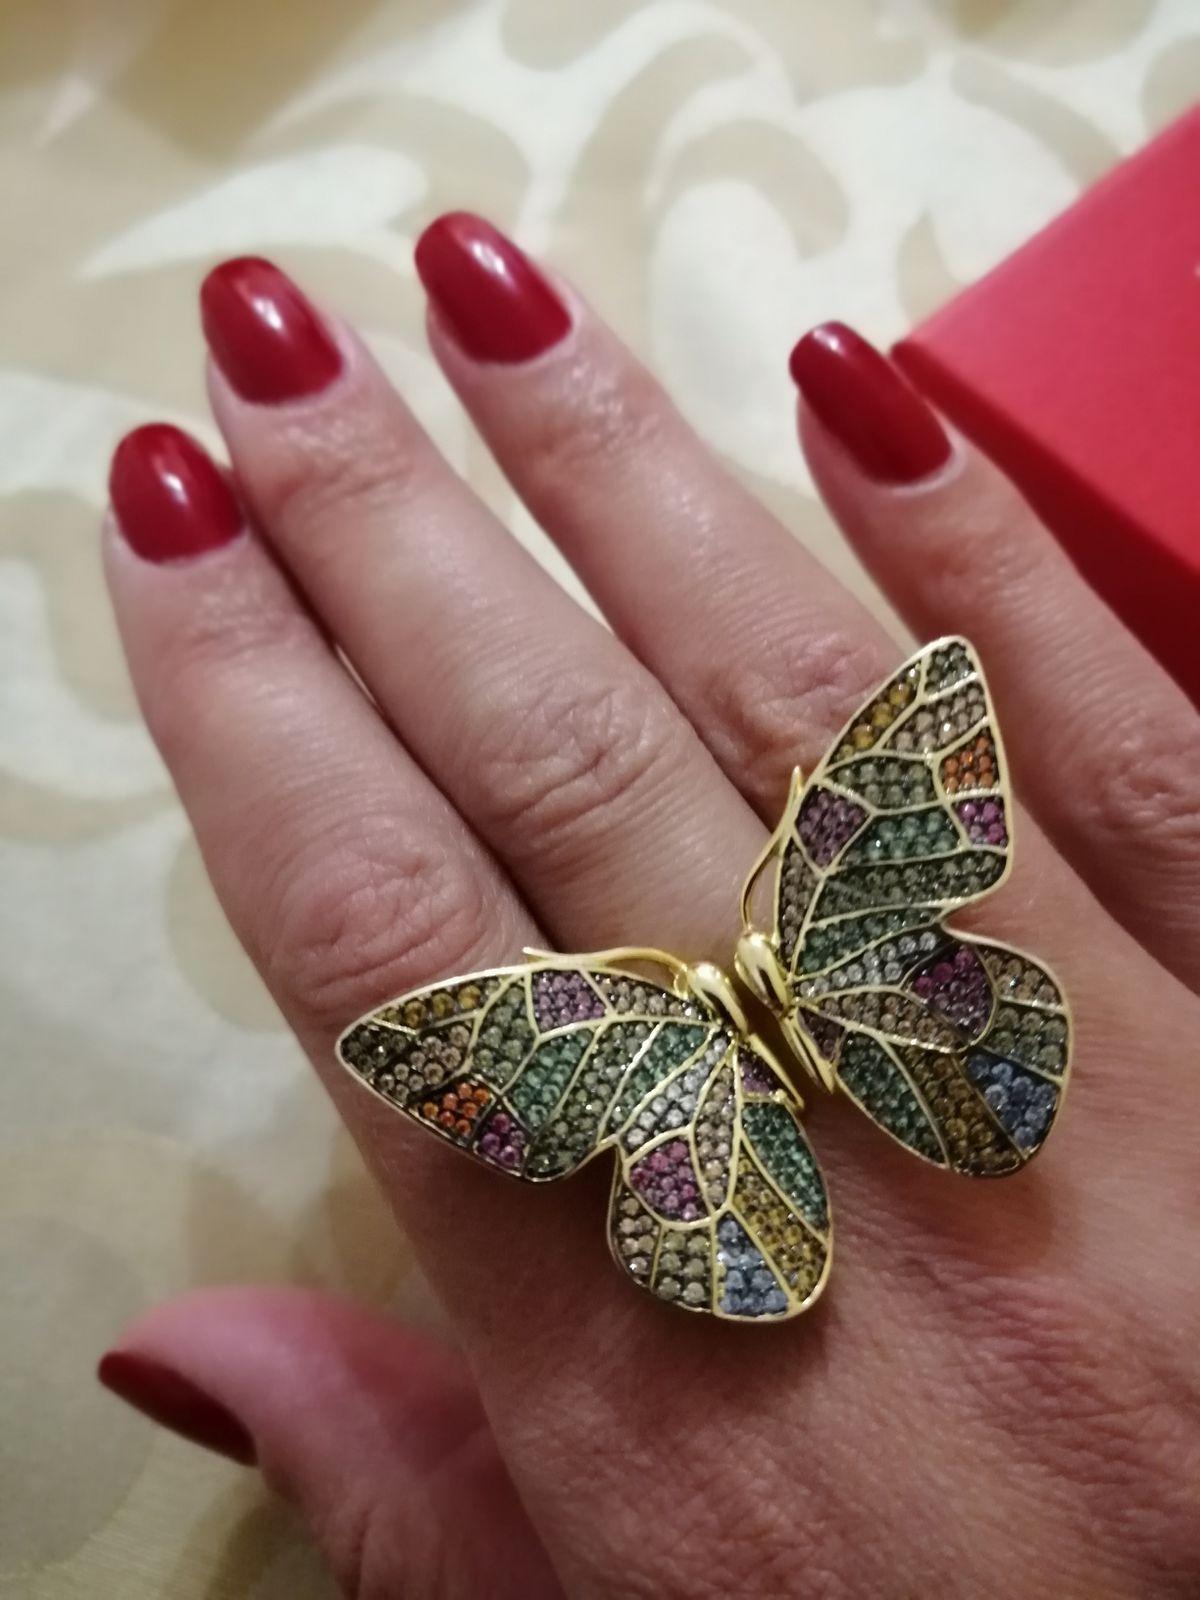 Ммм, бабочка....